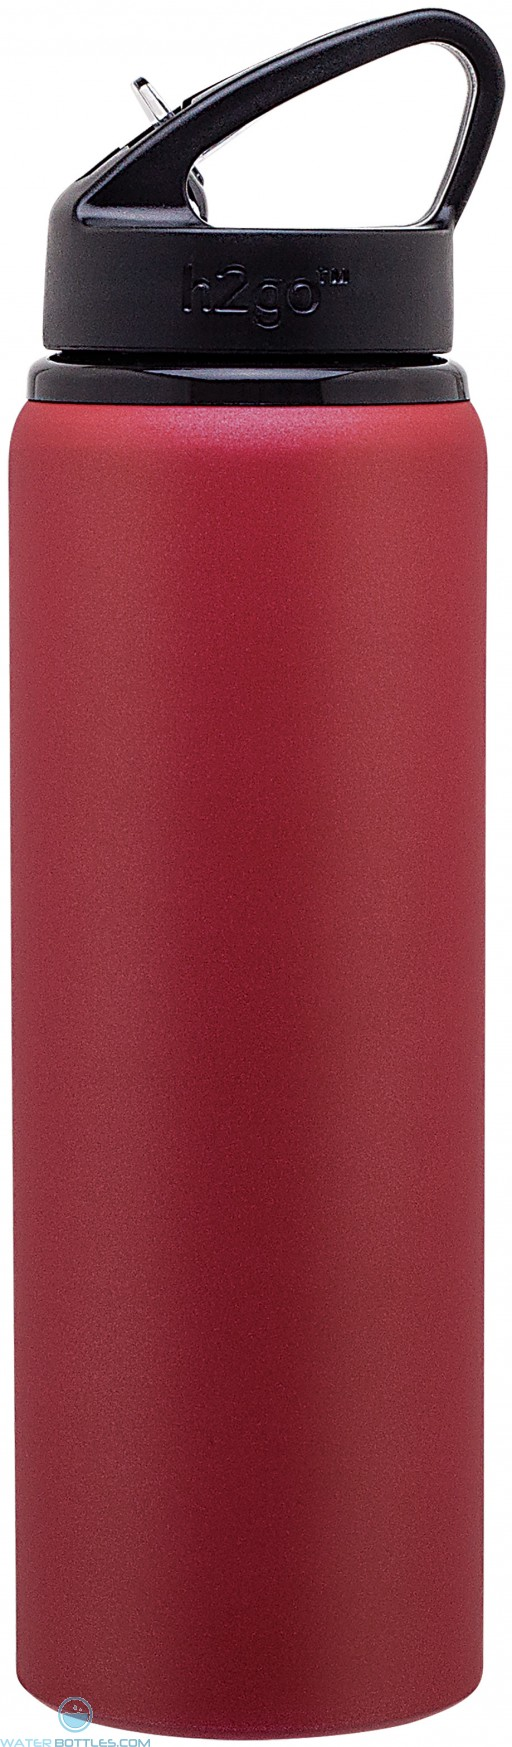 H2Go Allure Aluminum Water Bottles | 28 oz - Matte Red